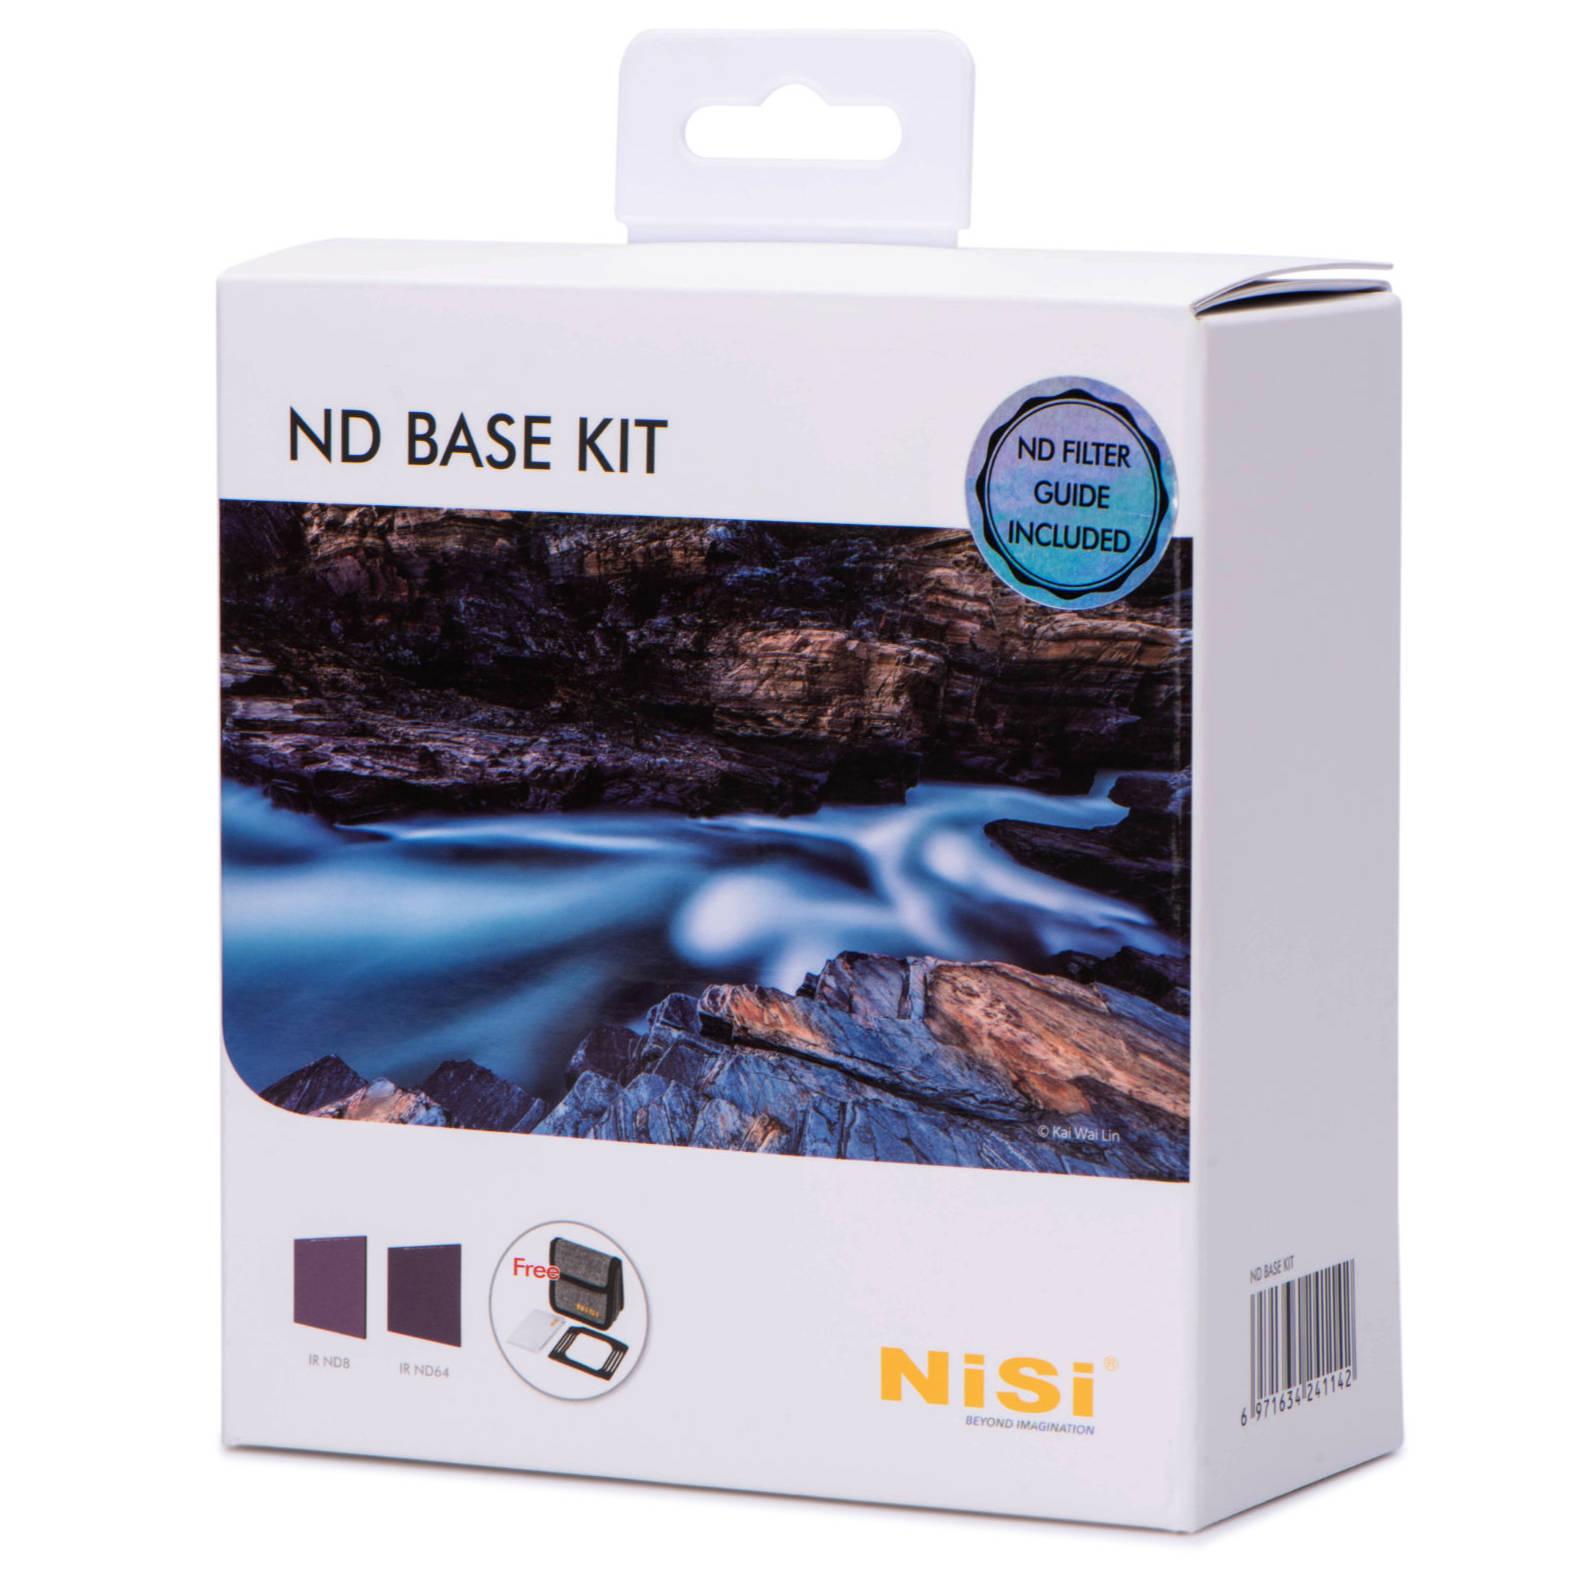 ND Base Kit